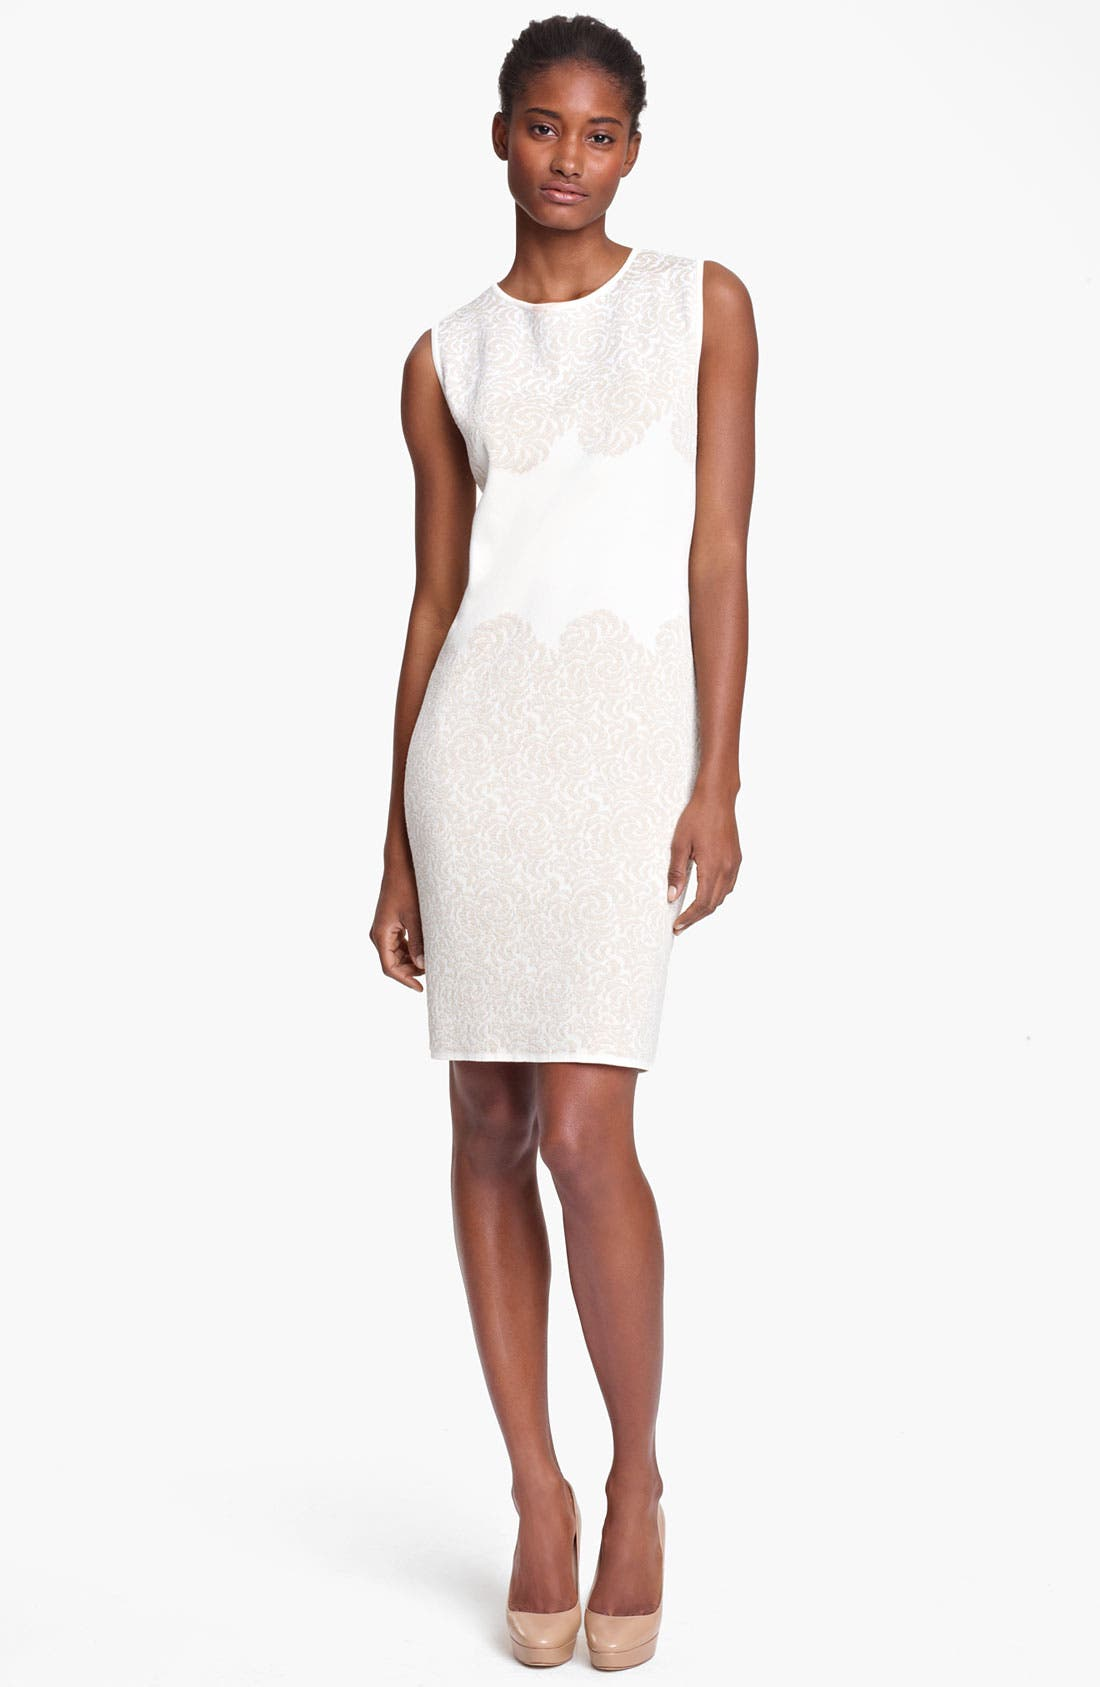 Alternate Image 1 Selected - Max Mara 'Emma' Sleeveless Knit Dress